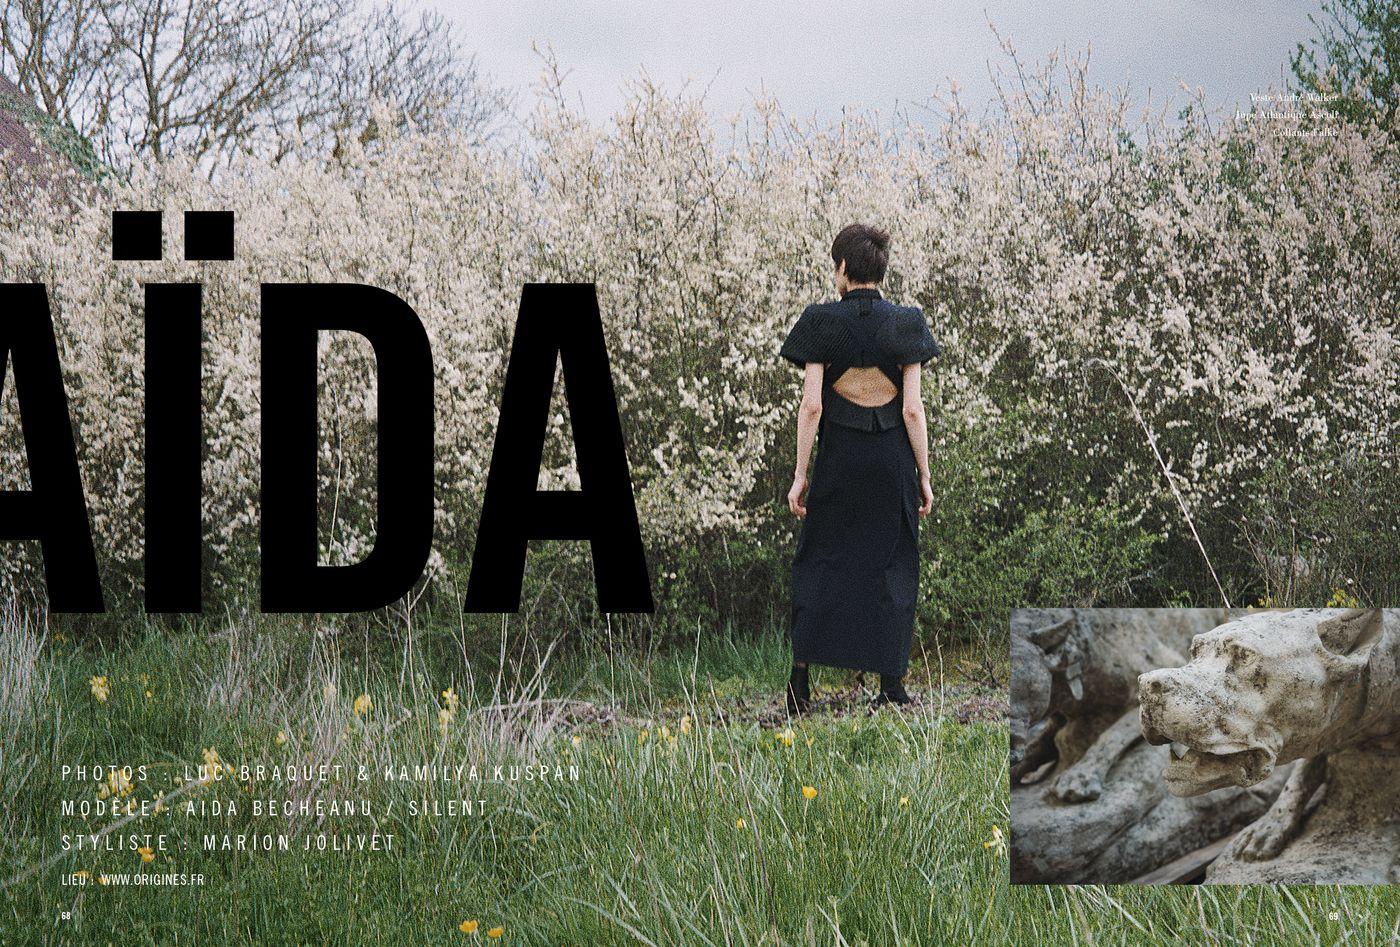 Possession Immédiate Volume 5 - Photographies de Luc Braquet et de Kamilya Kuspan avec Aida Becheanu, Aida